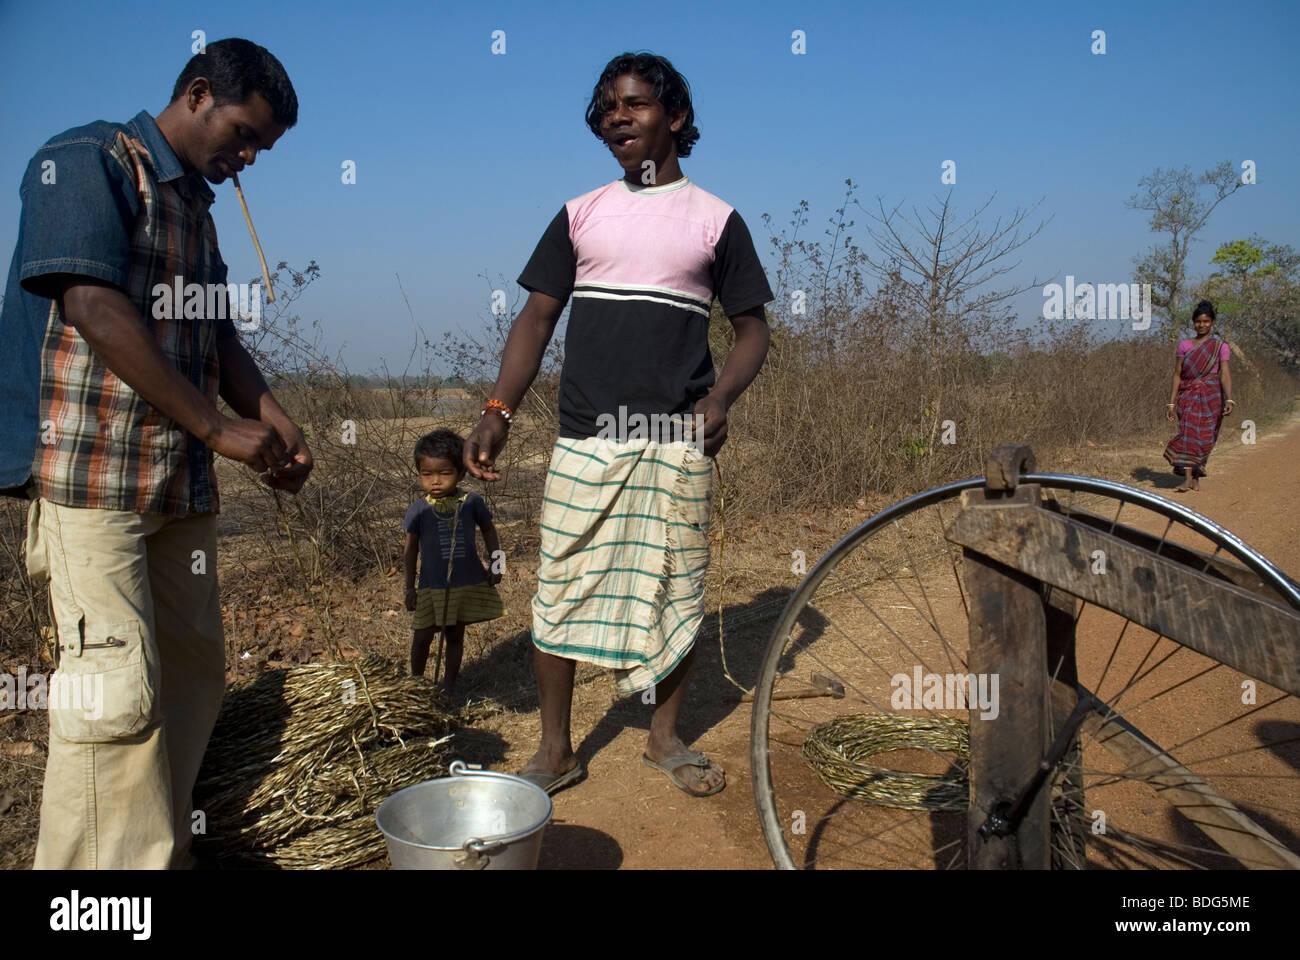 Workers in the road to Baripada, Orissa, India. - Stock Image